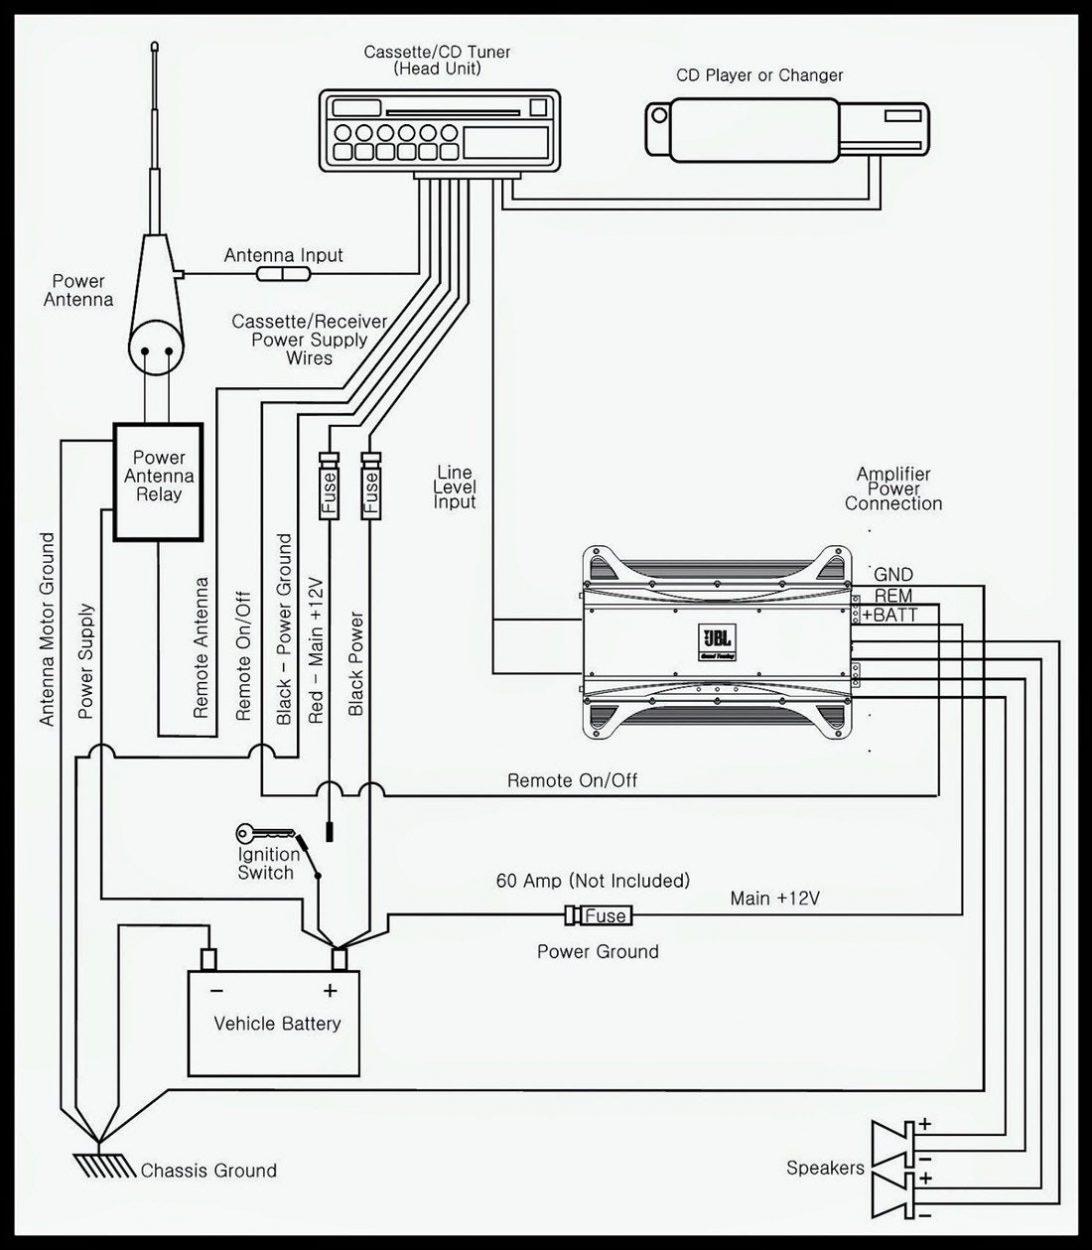 Landscape Lighting Wiring Diagram